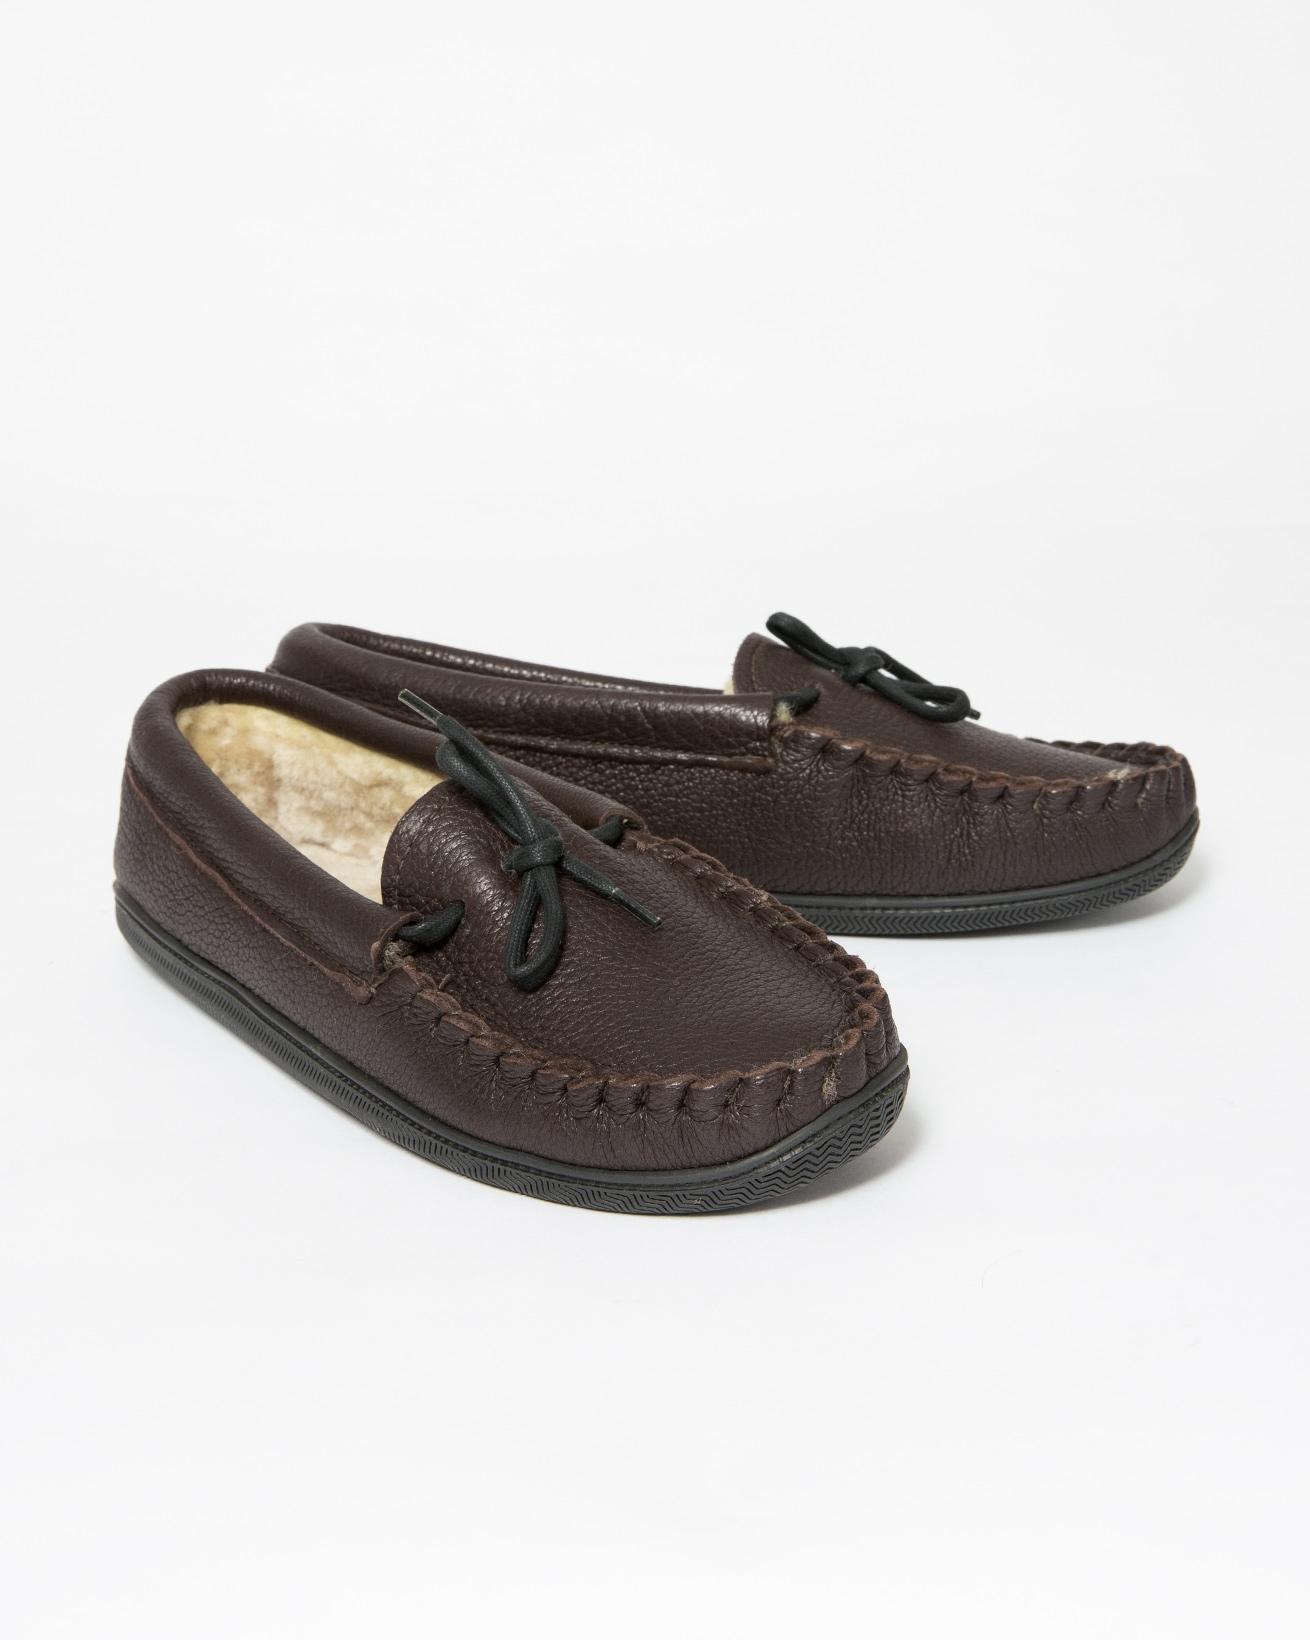 Huron Slipper - Size 6 - Brown